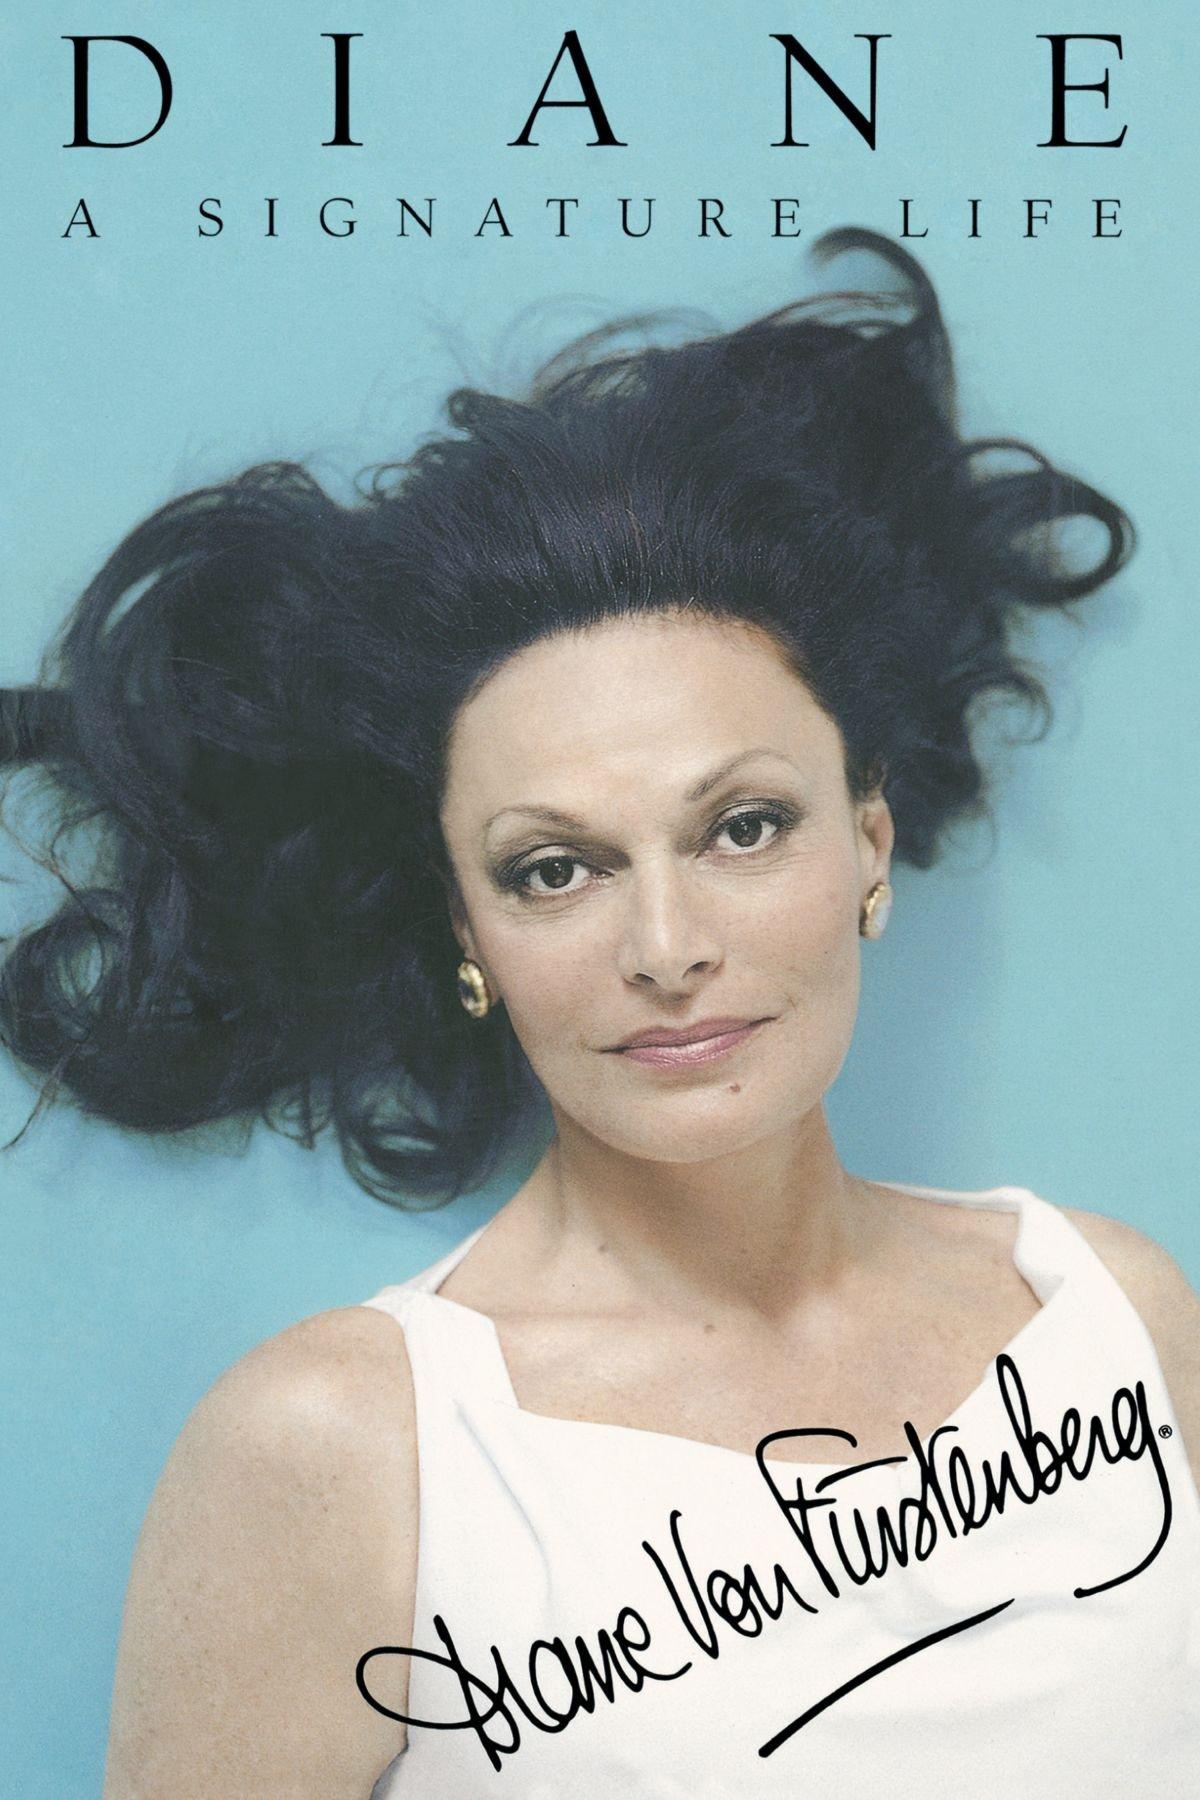 05eeadc47 Diane: A Signature Life Paperback – June 11, 2009. by Diane von Furstenberg  ...